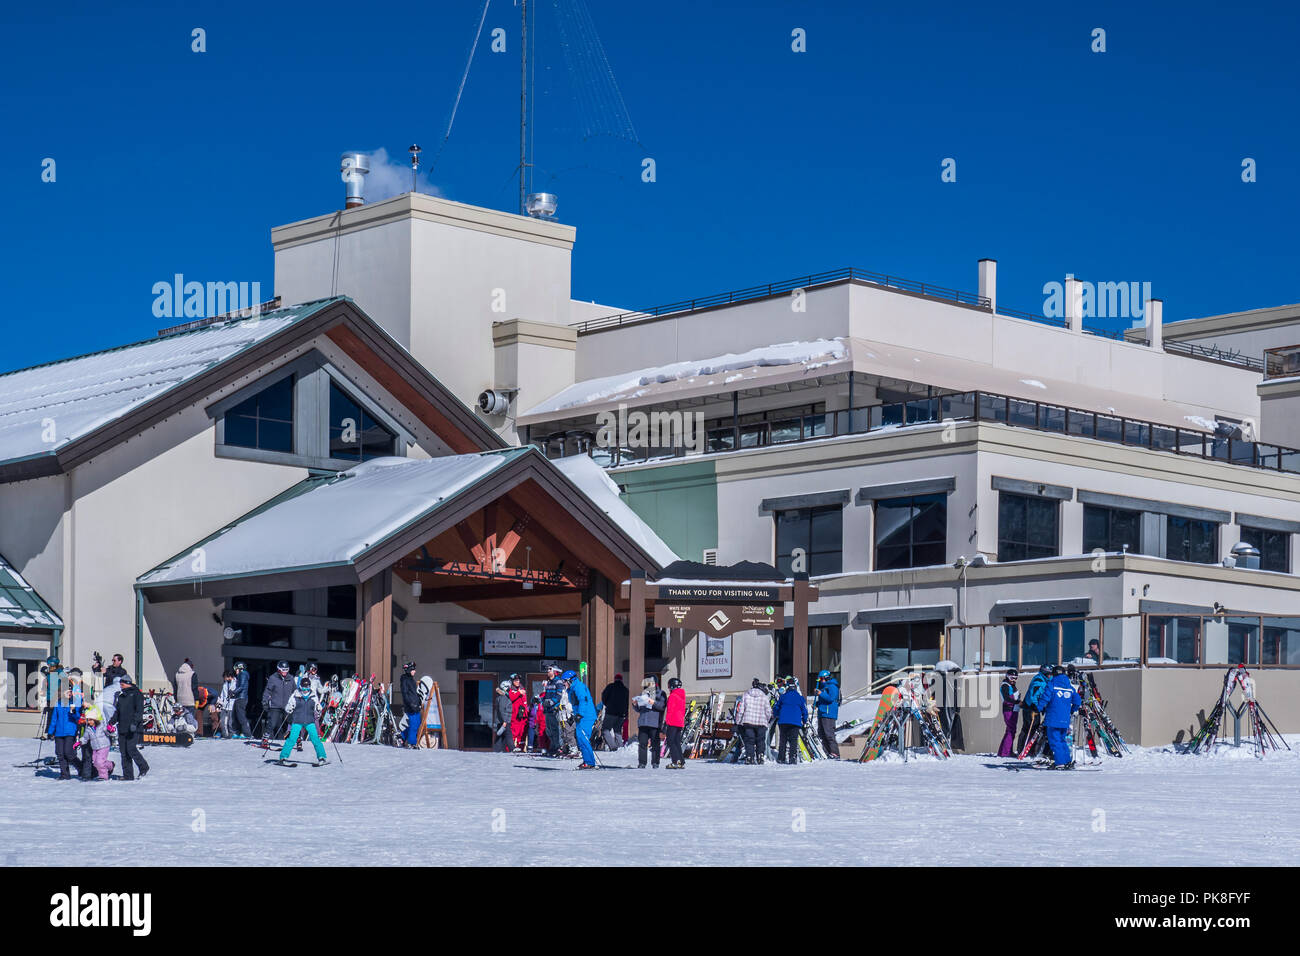 Eagle's Nest, winter, Vail Ski Resort, Vail, Colorado. - Stock Image